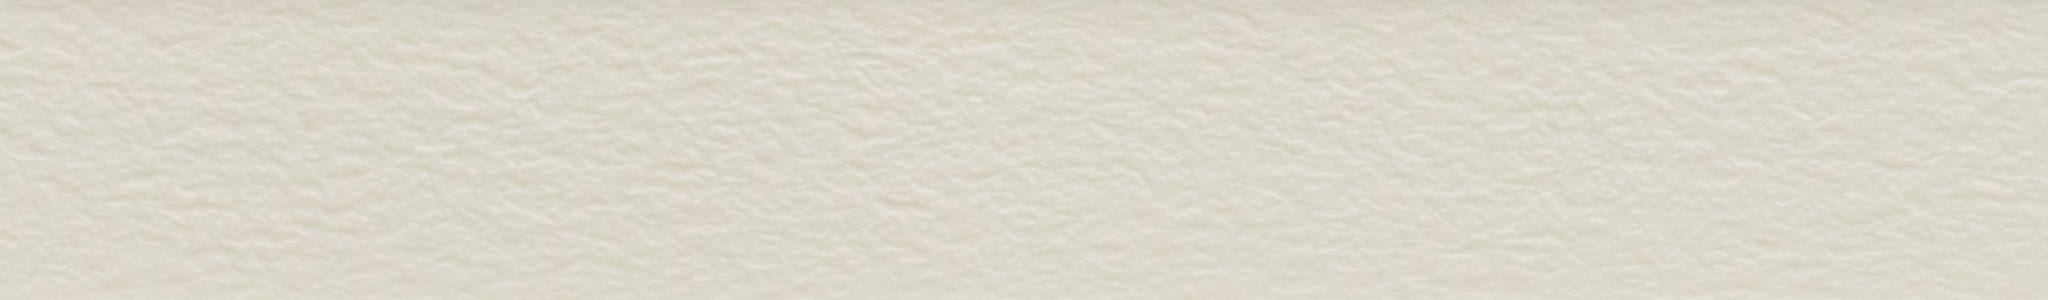 HU 171183 ABS hrana šedá perla XA